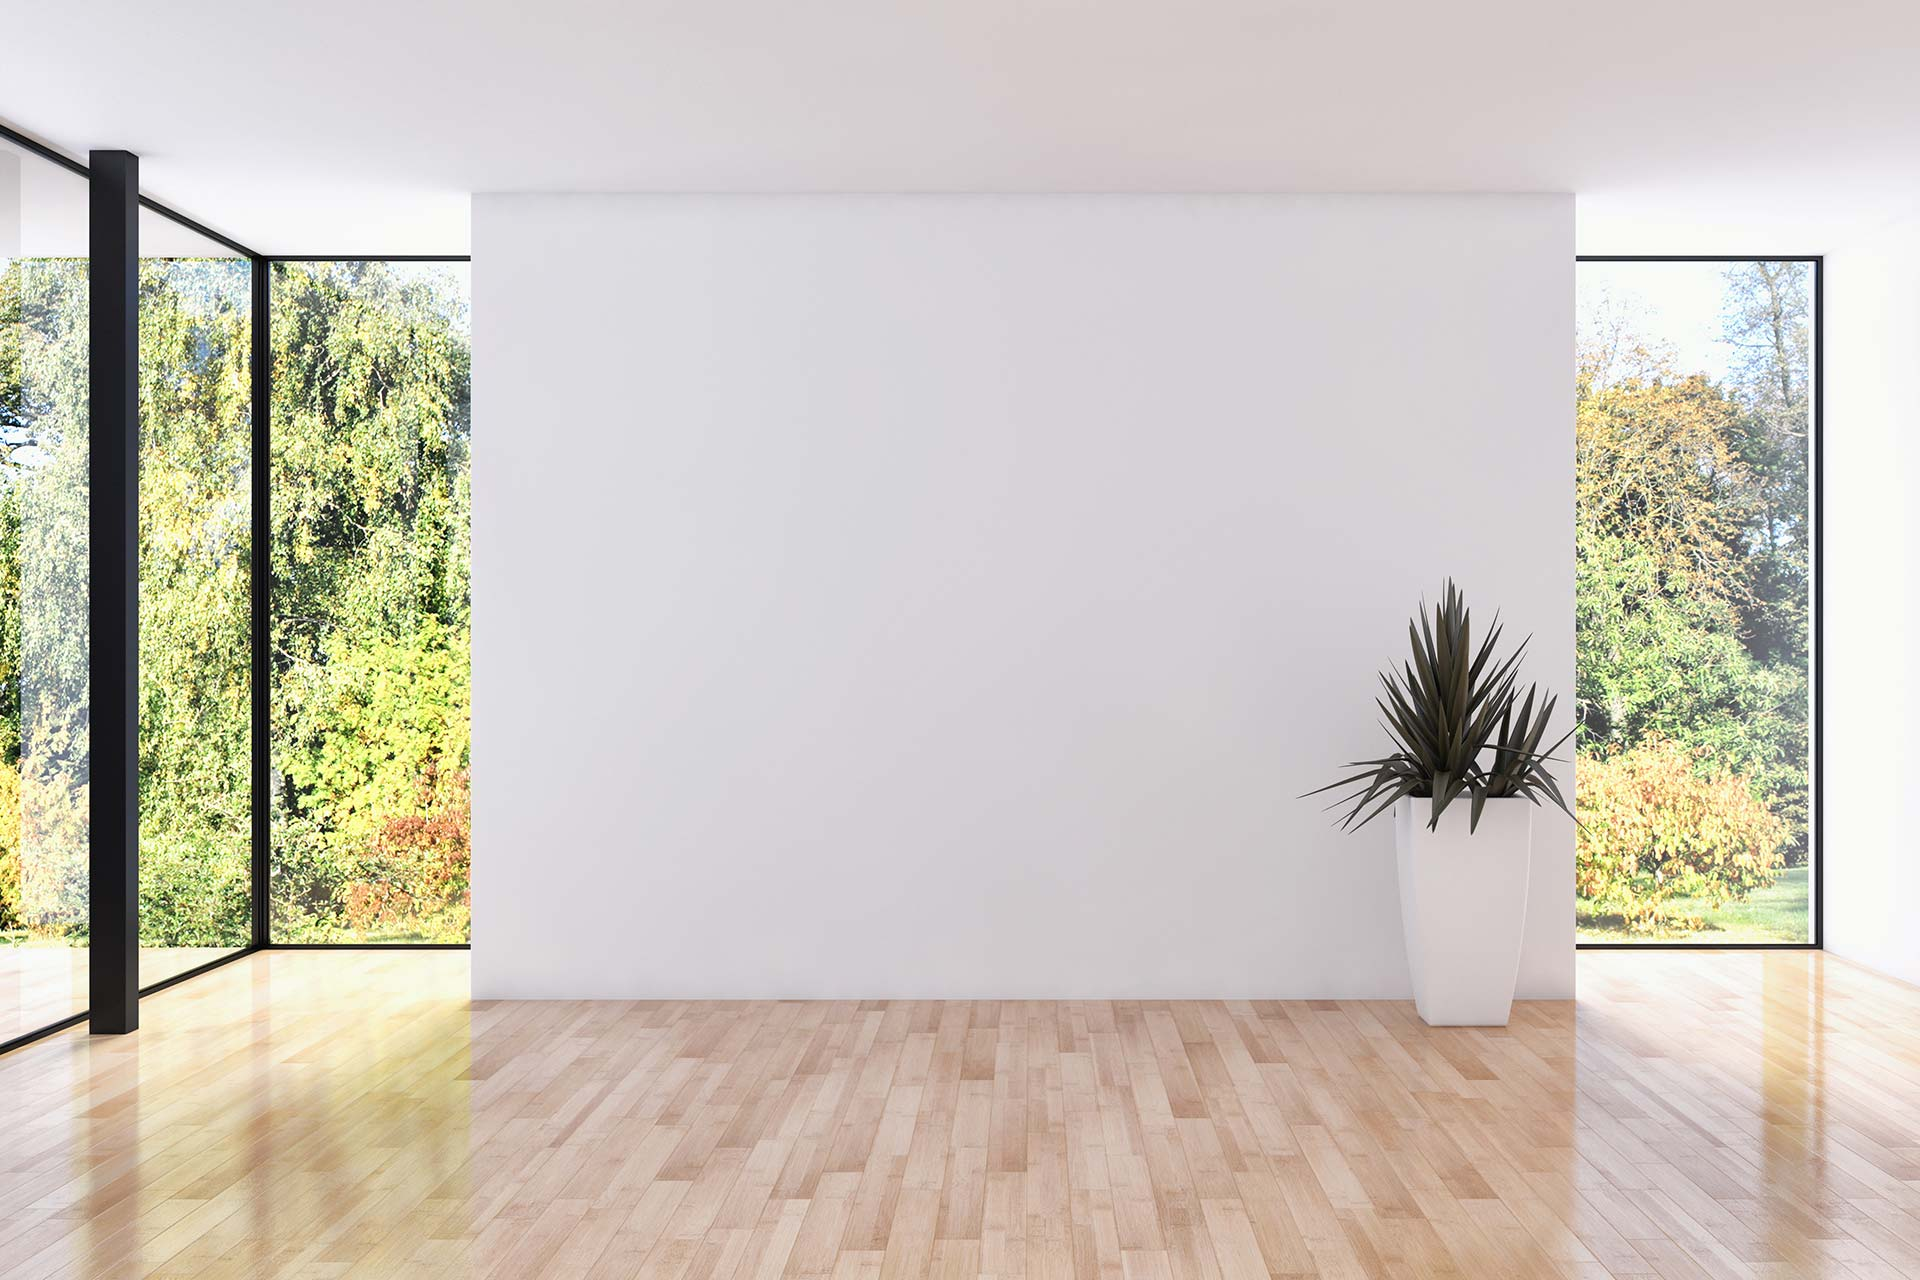 Putzarbeiten - Modernes, helles Apartment